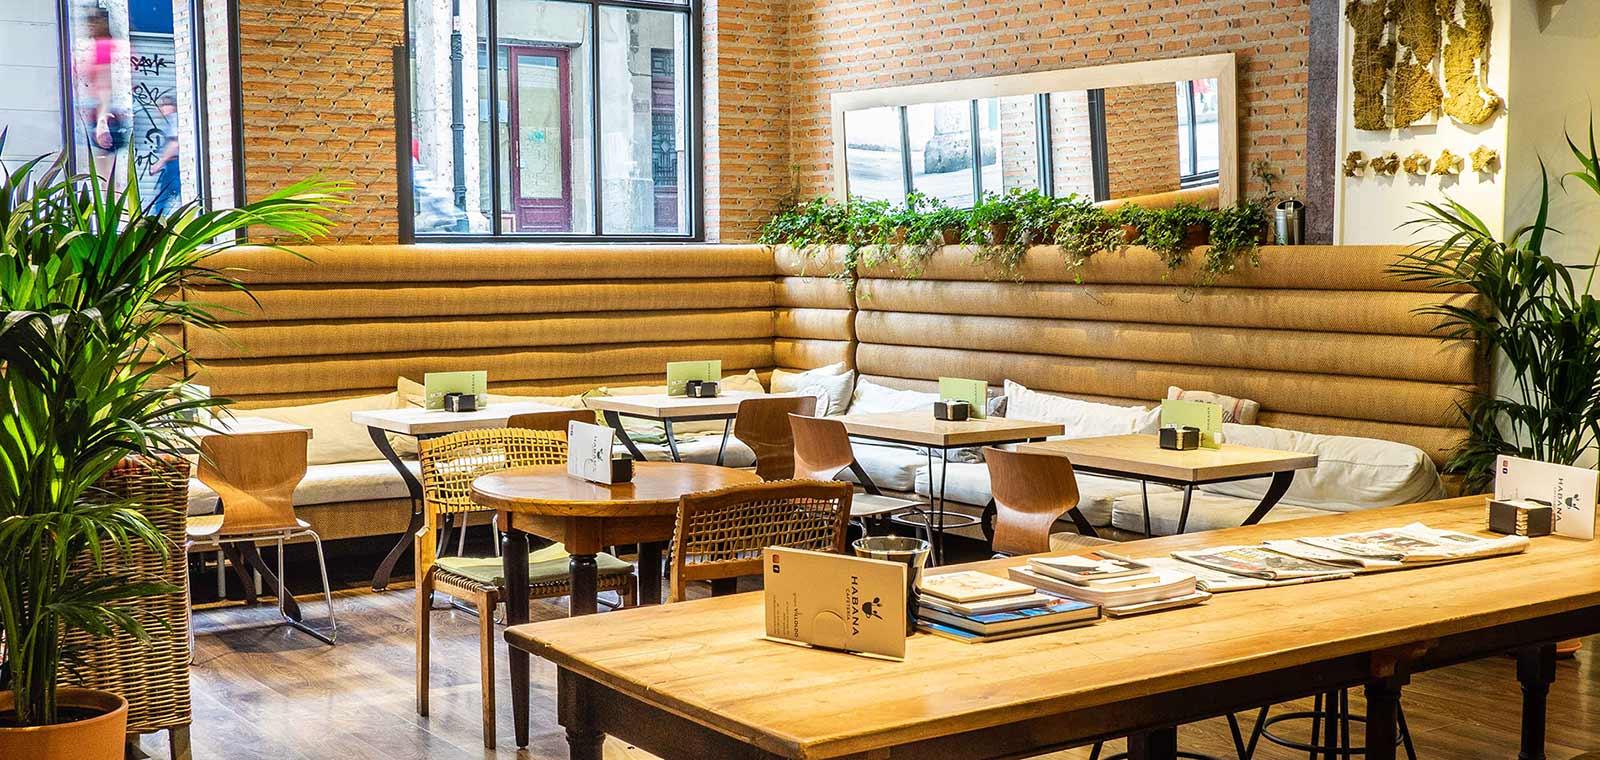 Habana Cafetería en Palencia